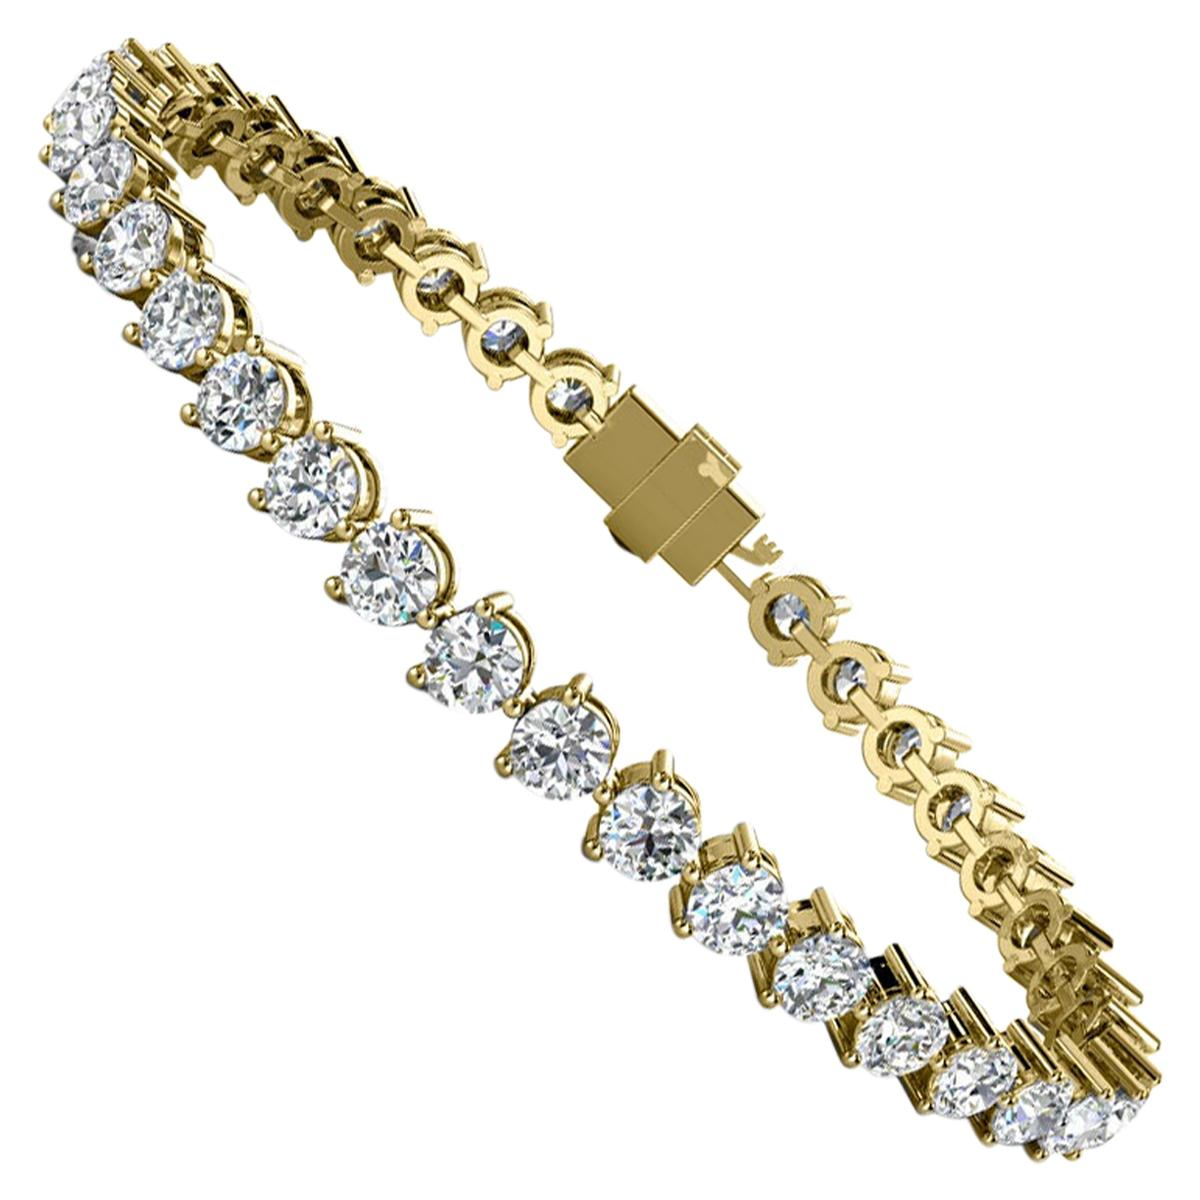 14 Karat Yellow Gold Three Prongs Diamond Tennis Bracelet '8 Carat'